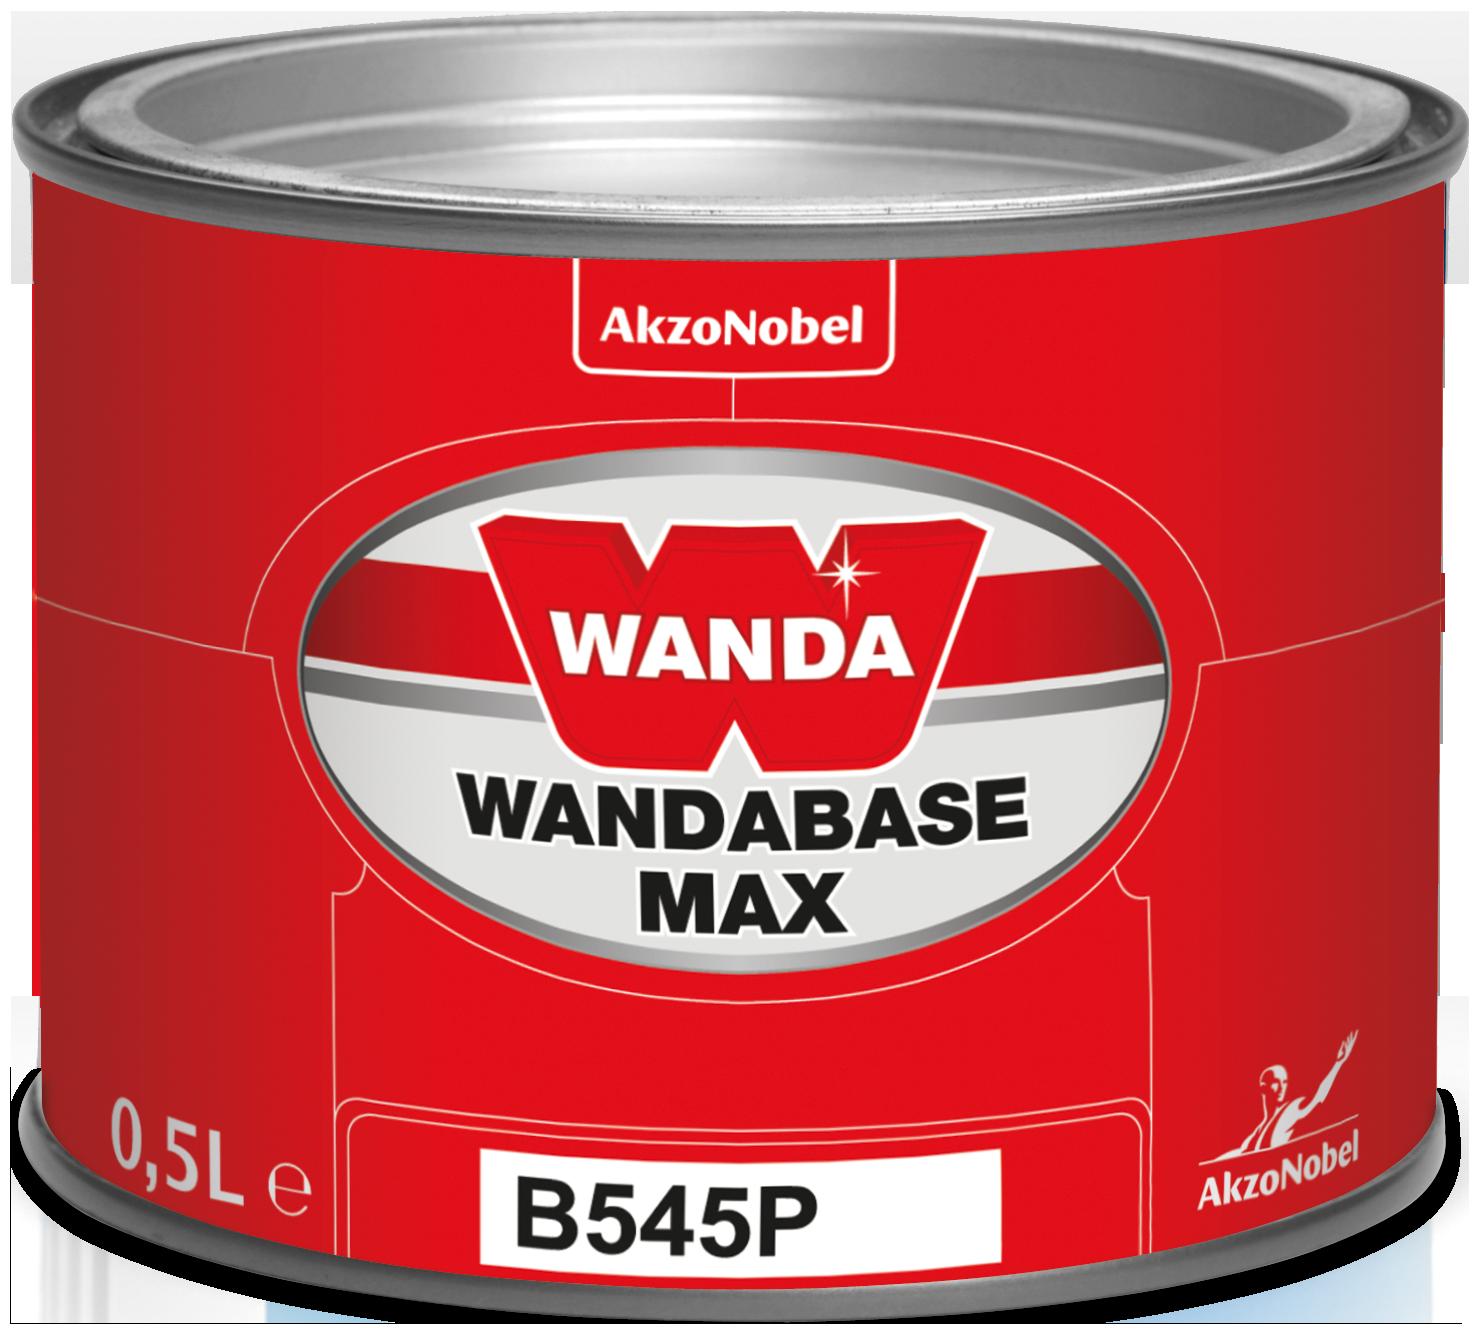 wan_wandabase-max_05l